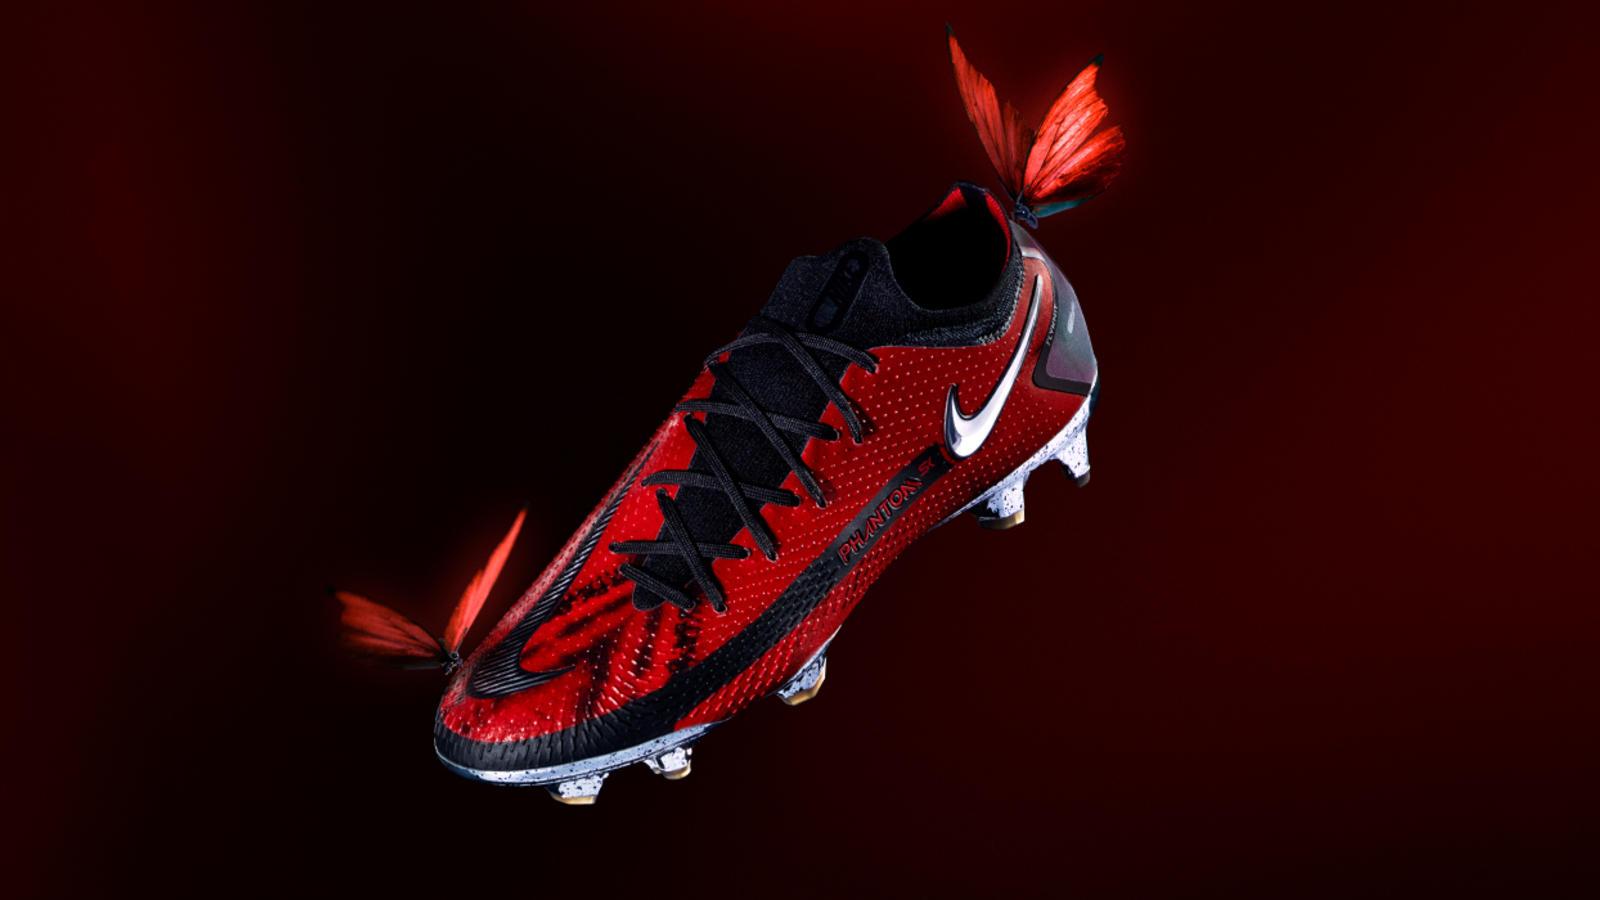 Football boots on feet